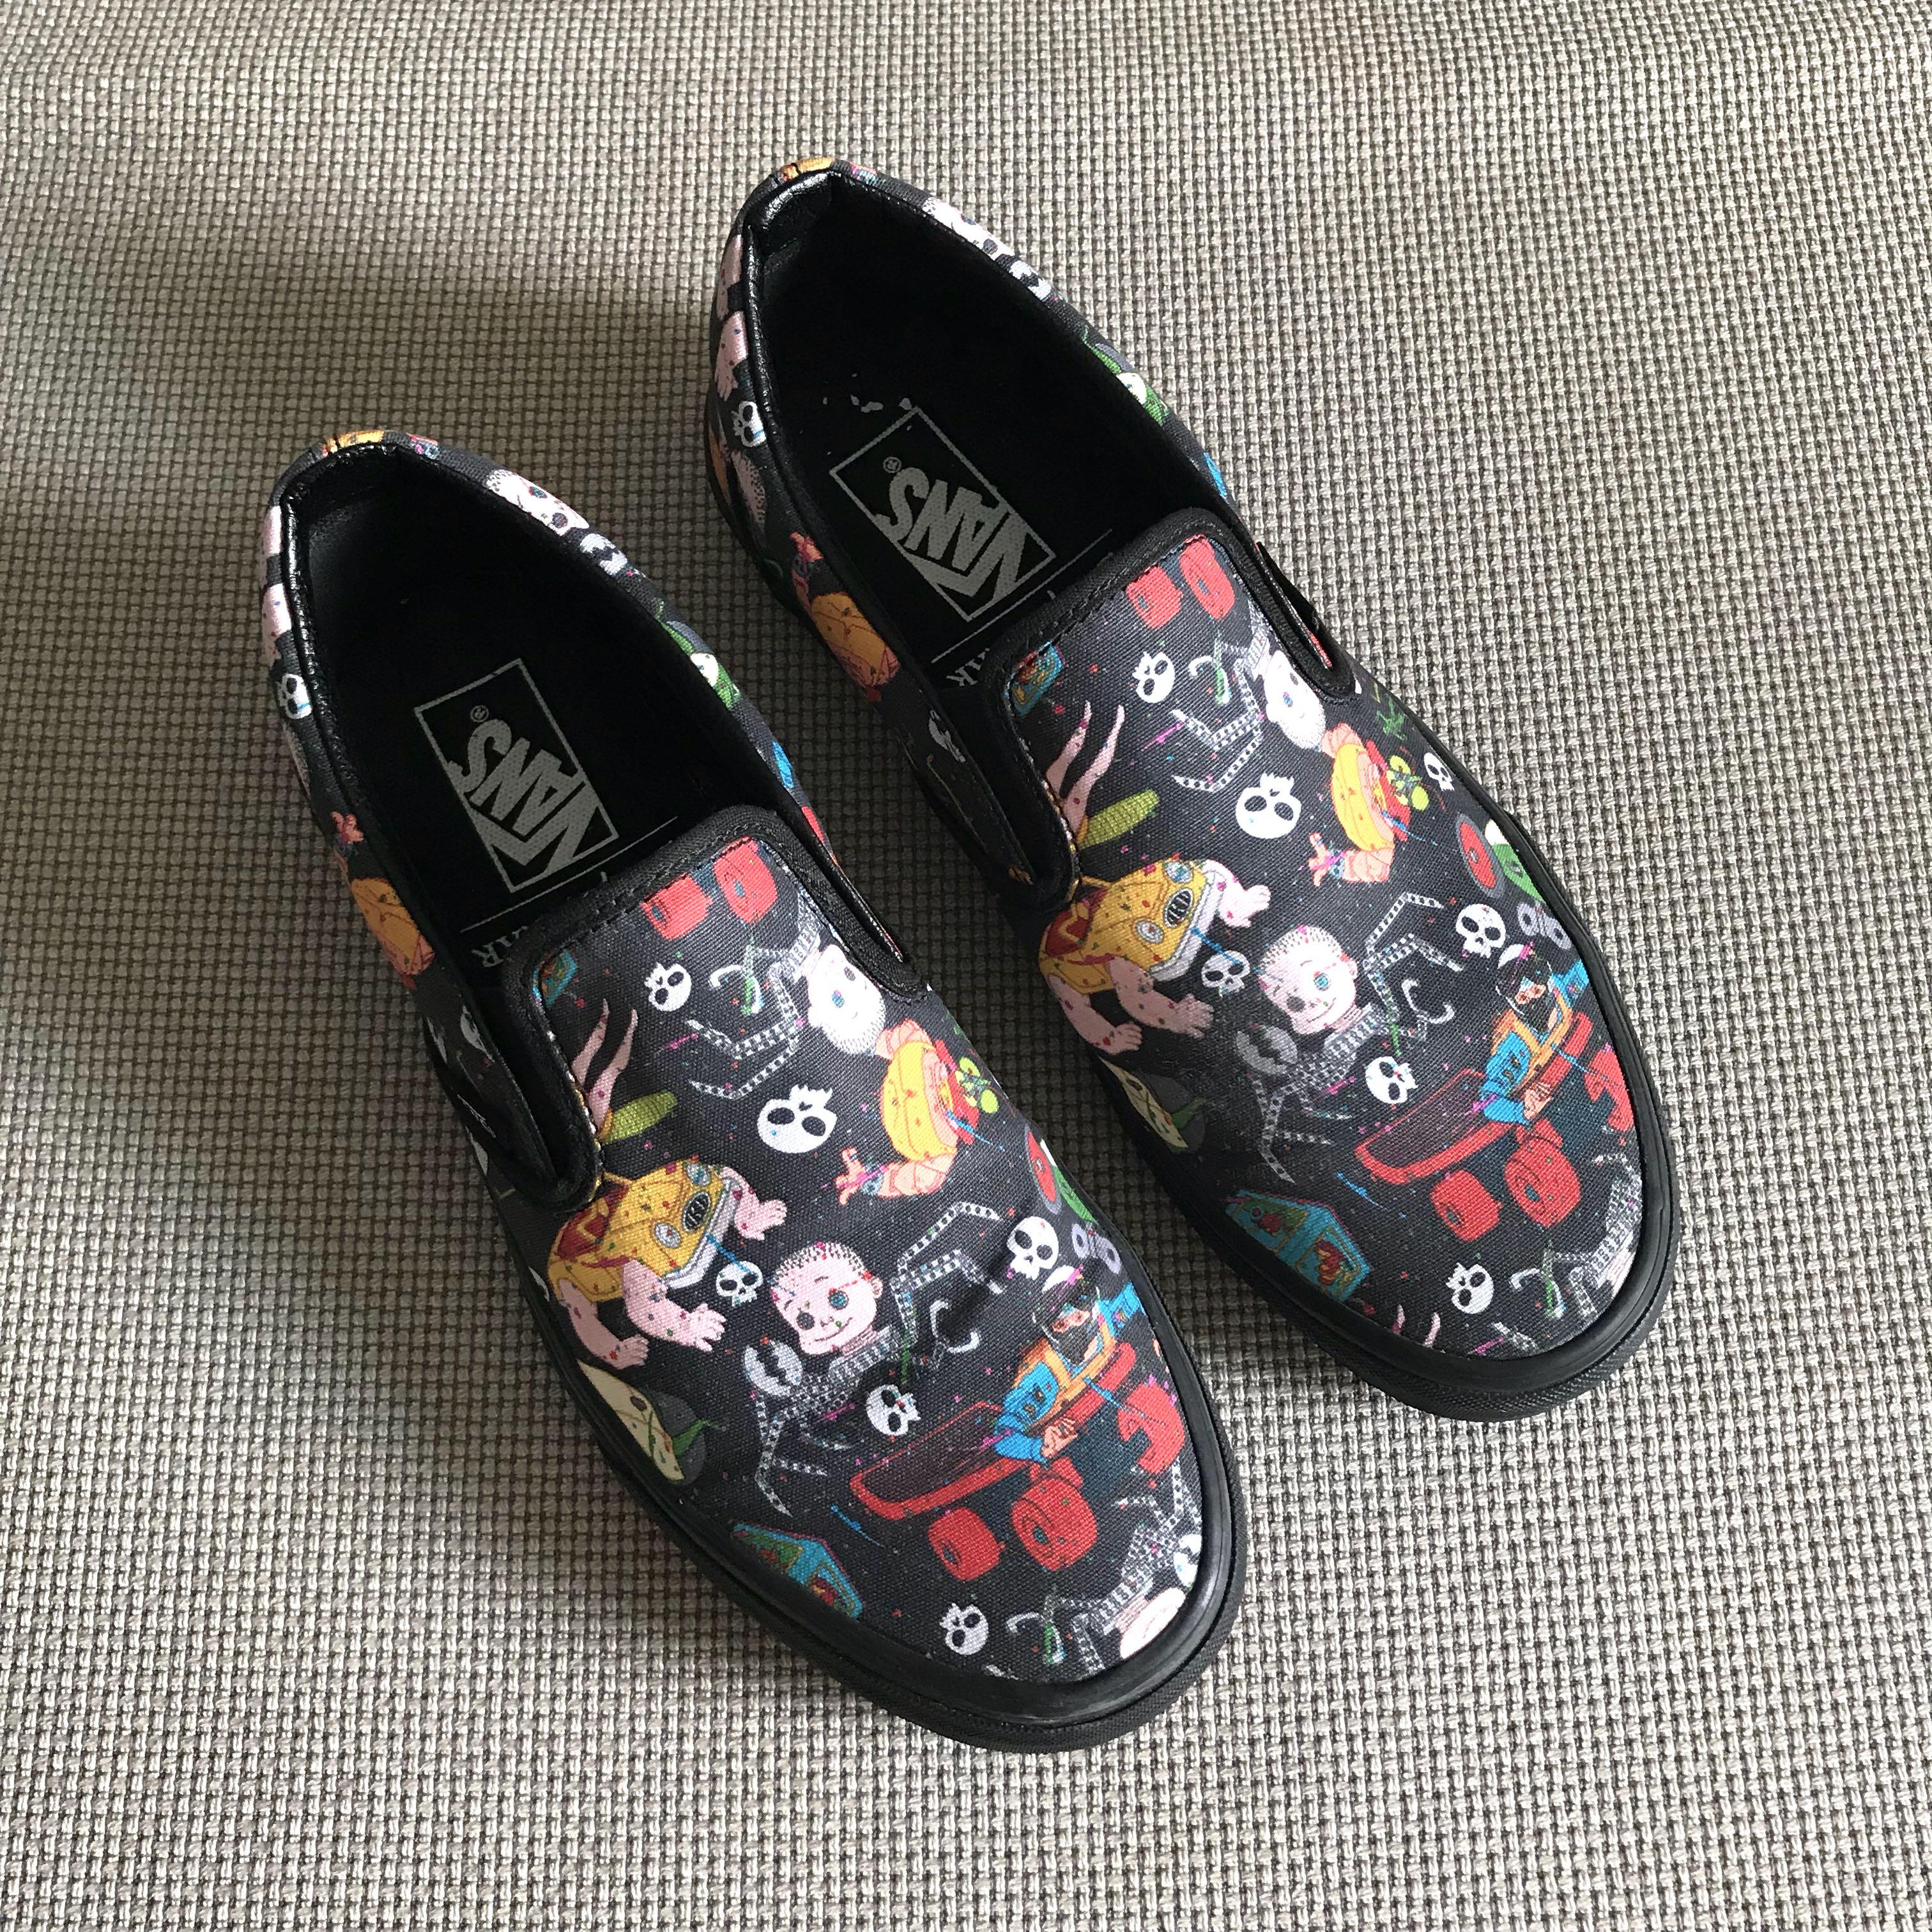 8ed9adb6db16ea Home · Men s Fashion · Footwear · Sneakers. photo photo photo photo